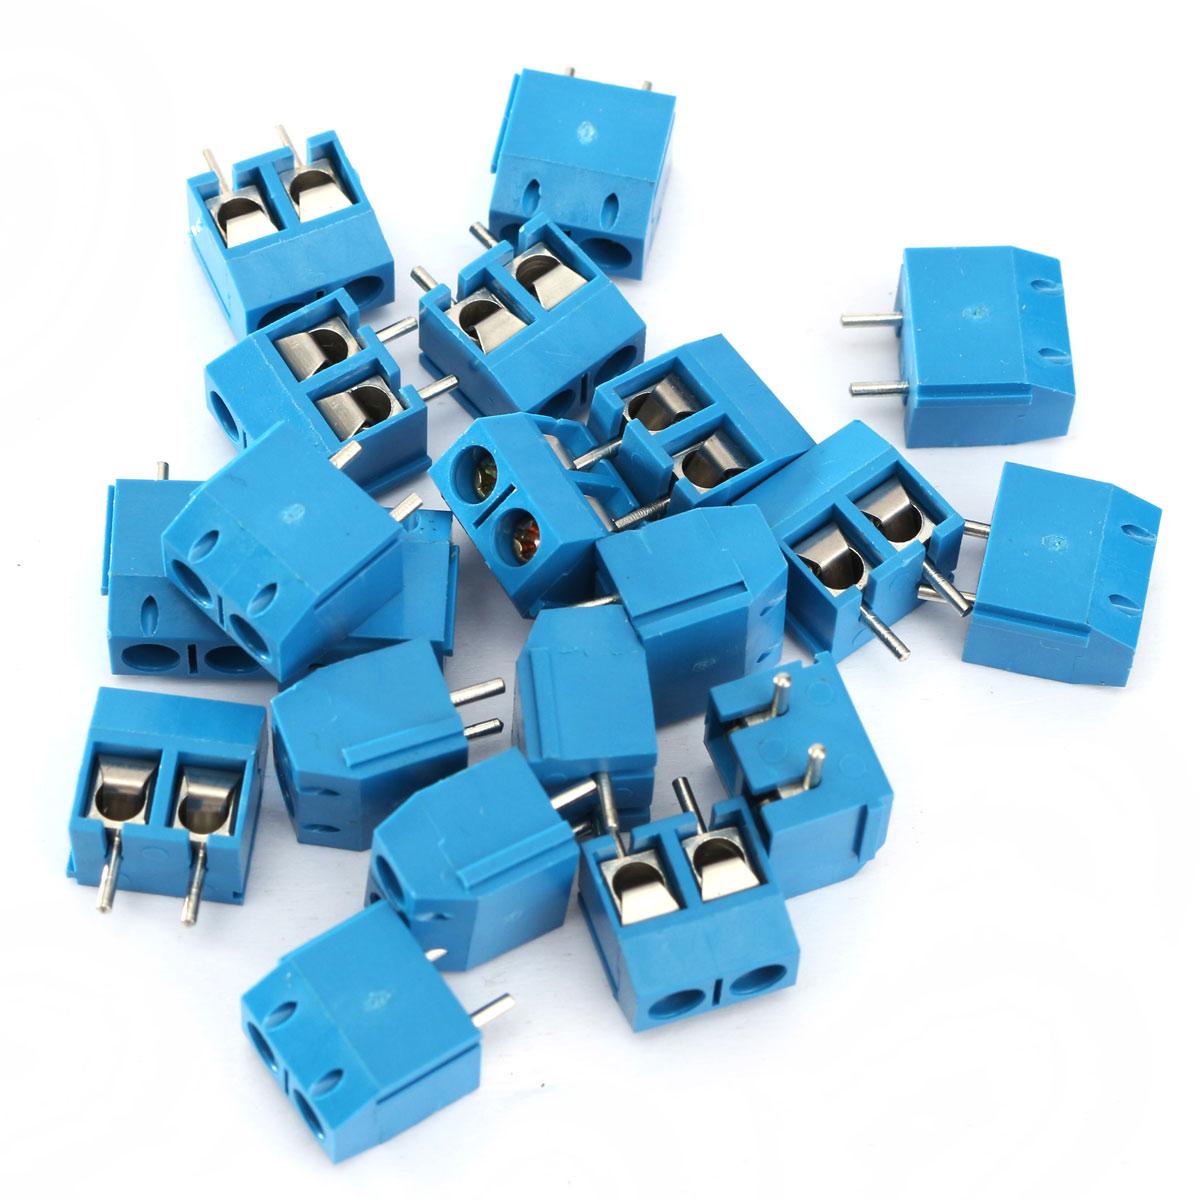 20/100pcs 2P Plug-in Screw Terminal Block Connector 5.08mm Pitch Blue